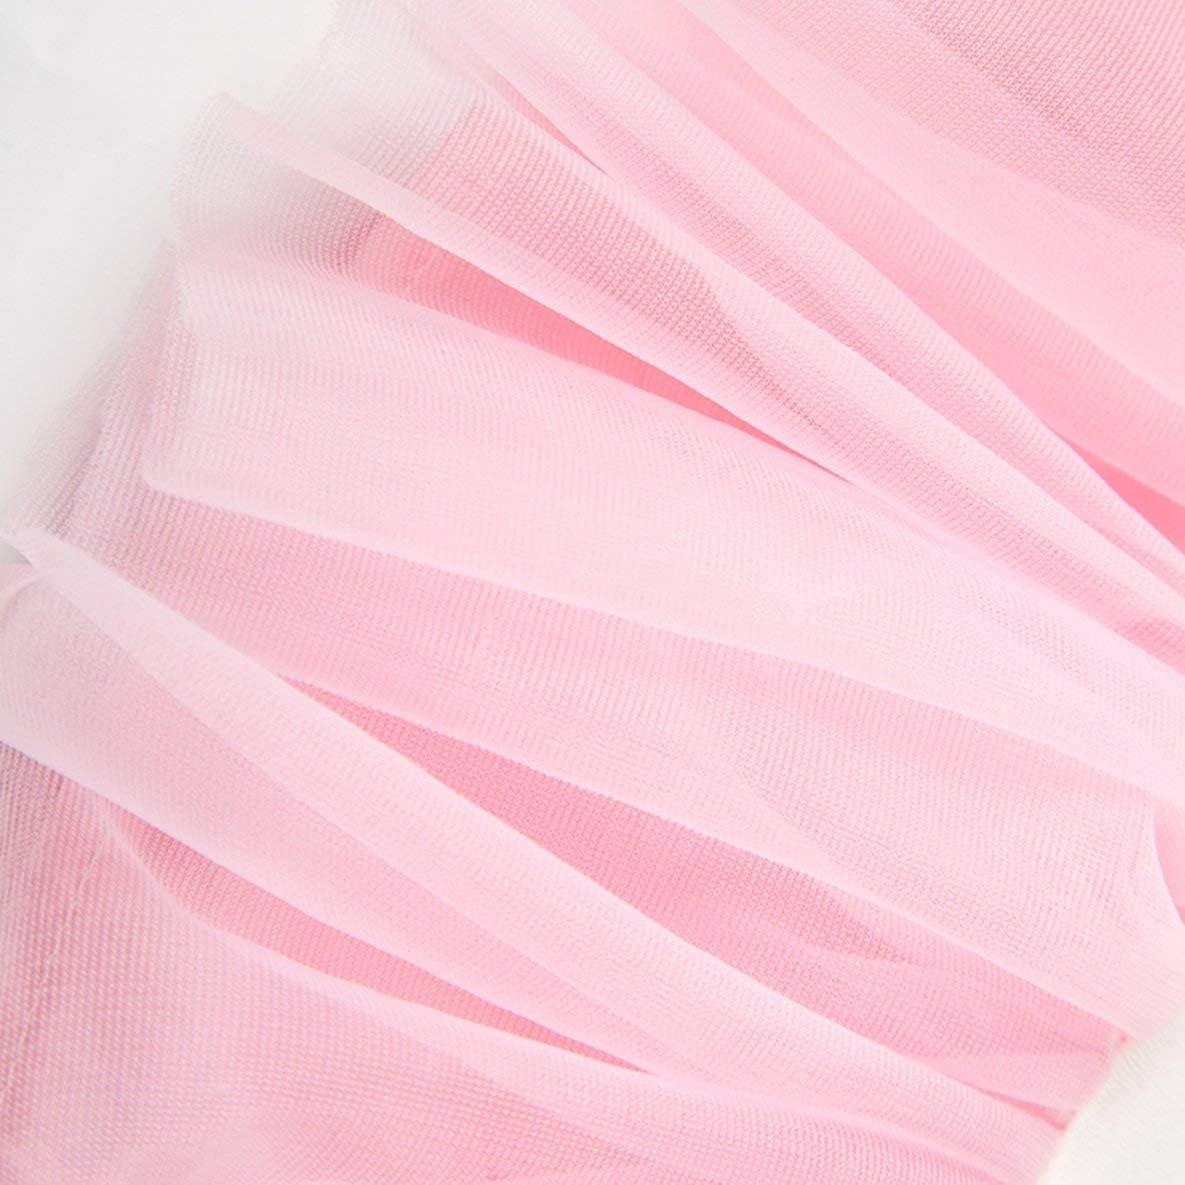 Rouku 18-Inch American Girl Doll Dress American Girl Tulle Skirt Doll Dress Dressing Clothes American Girl Doll Dress